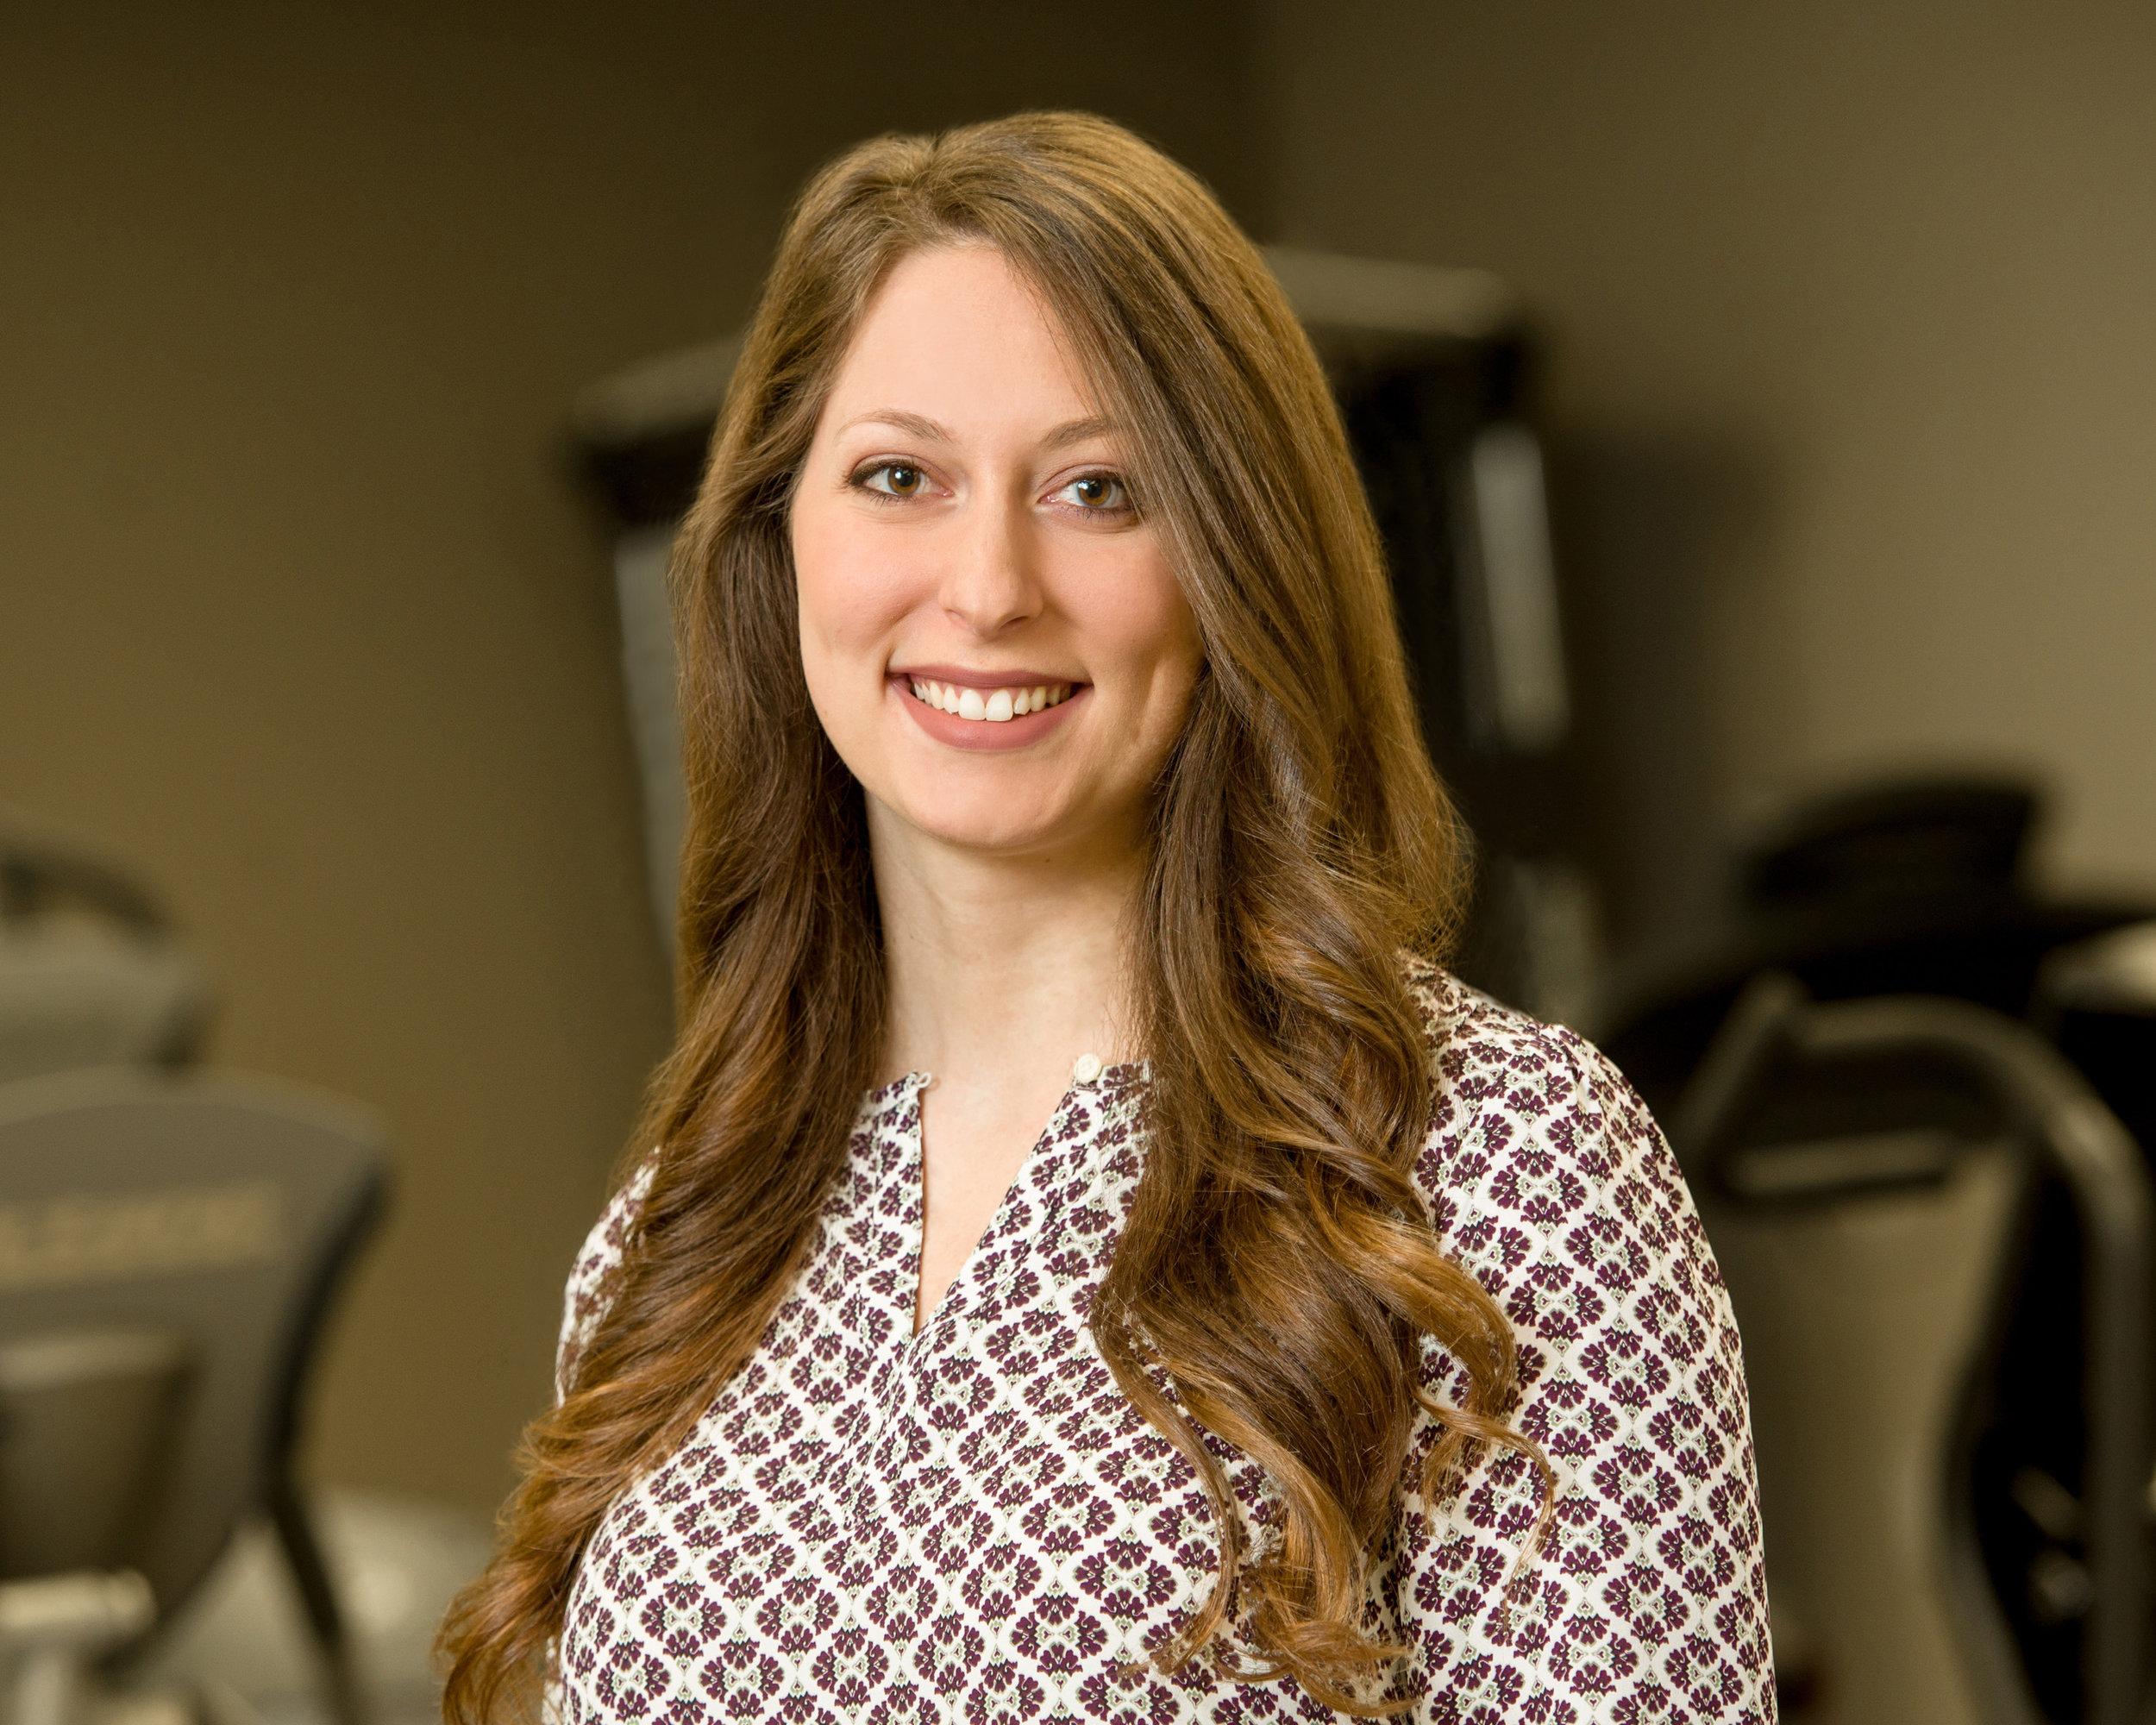 Lattimore Physical Therapist Rachel Weaver